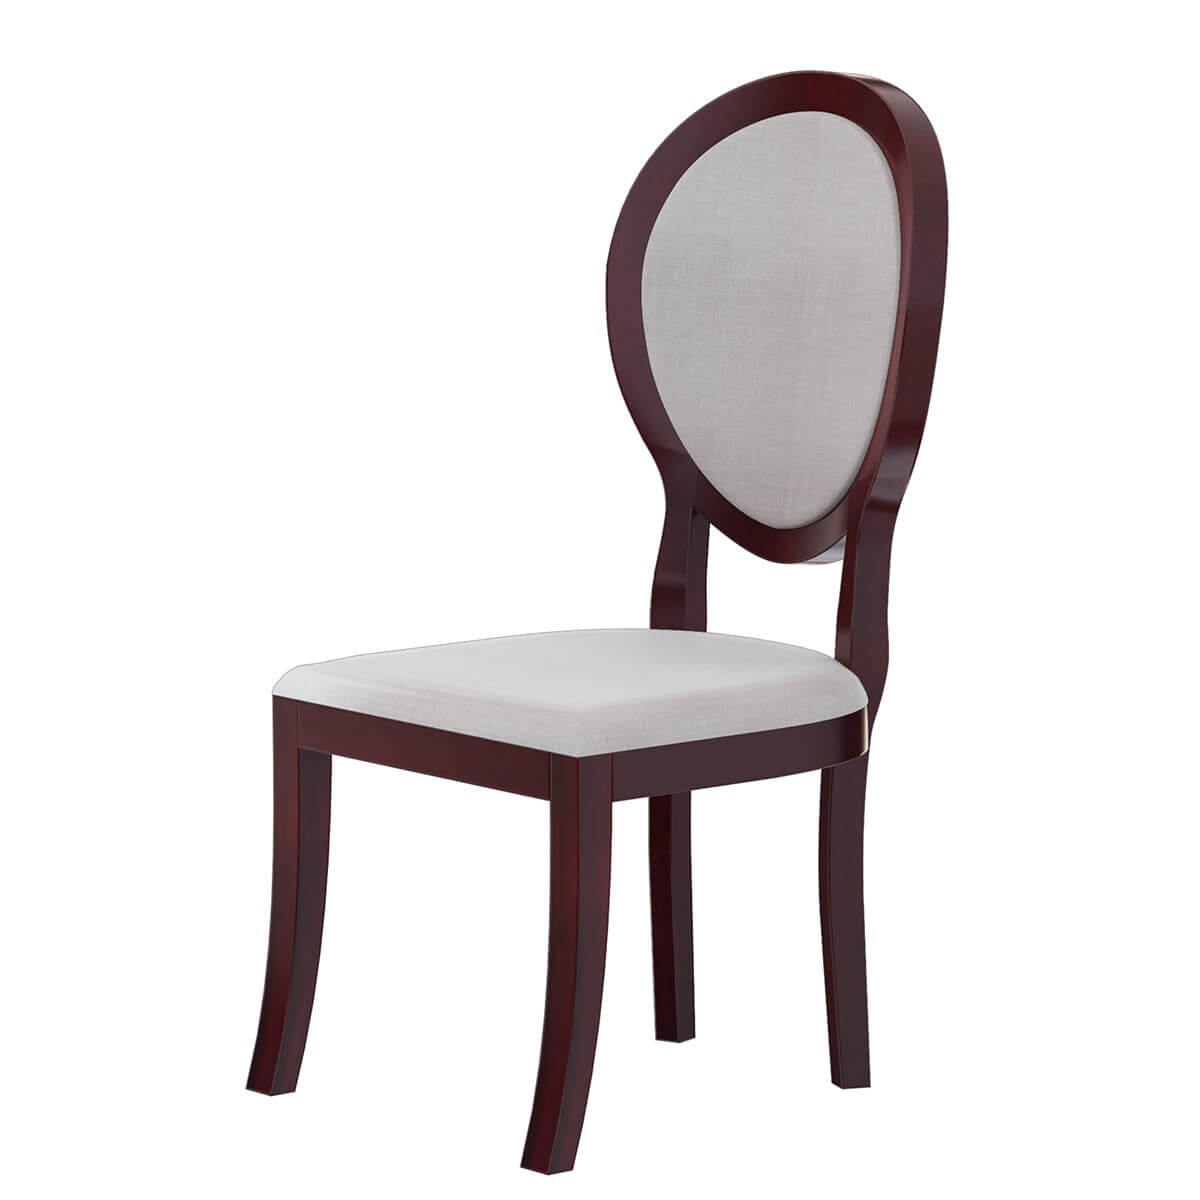 Aripeka Solid Mahogany Wood Upholstery Dining Chair